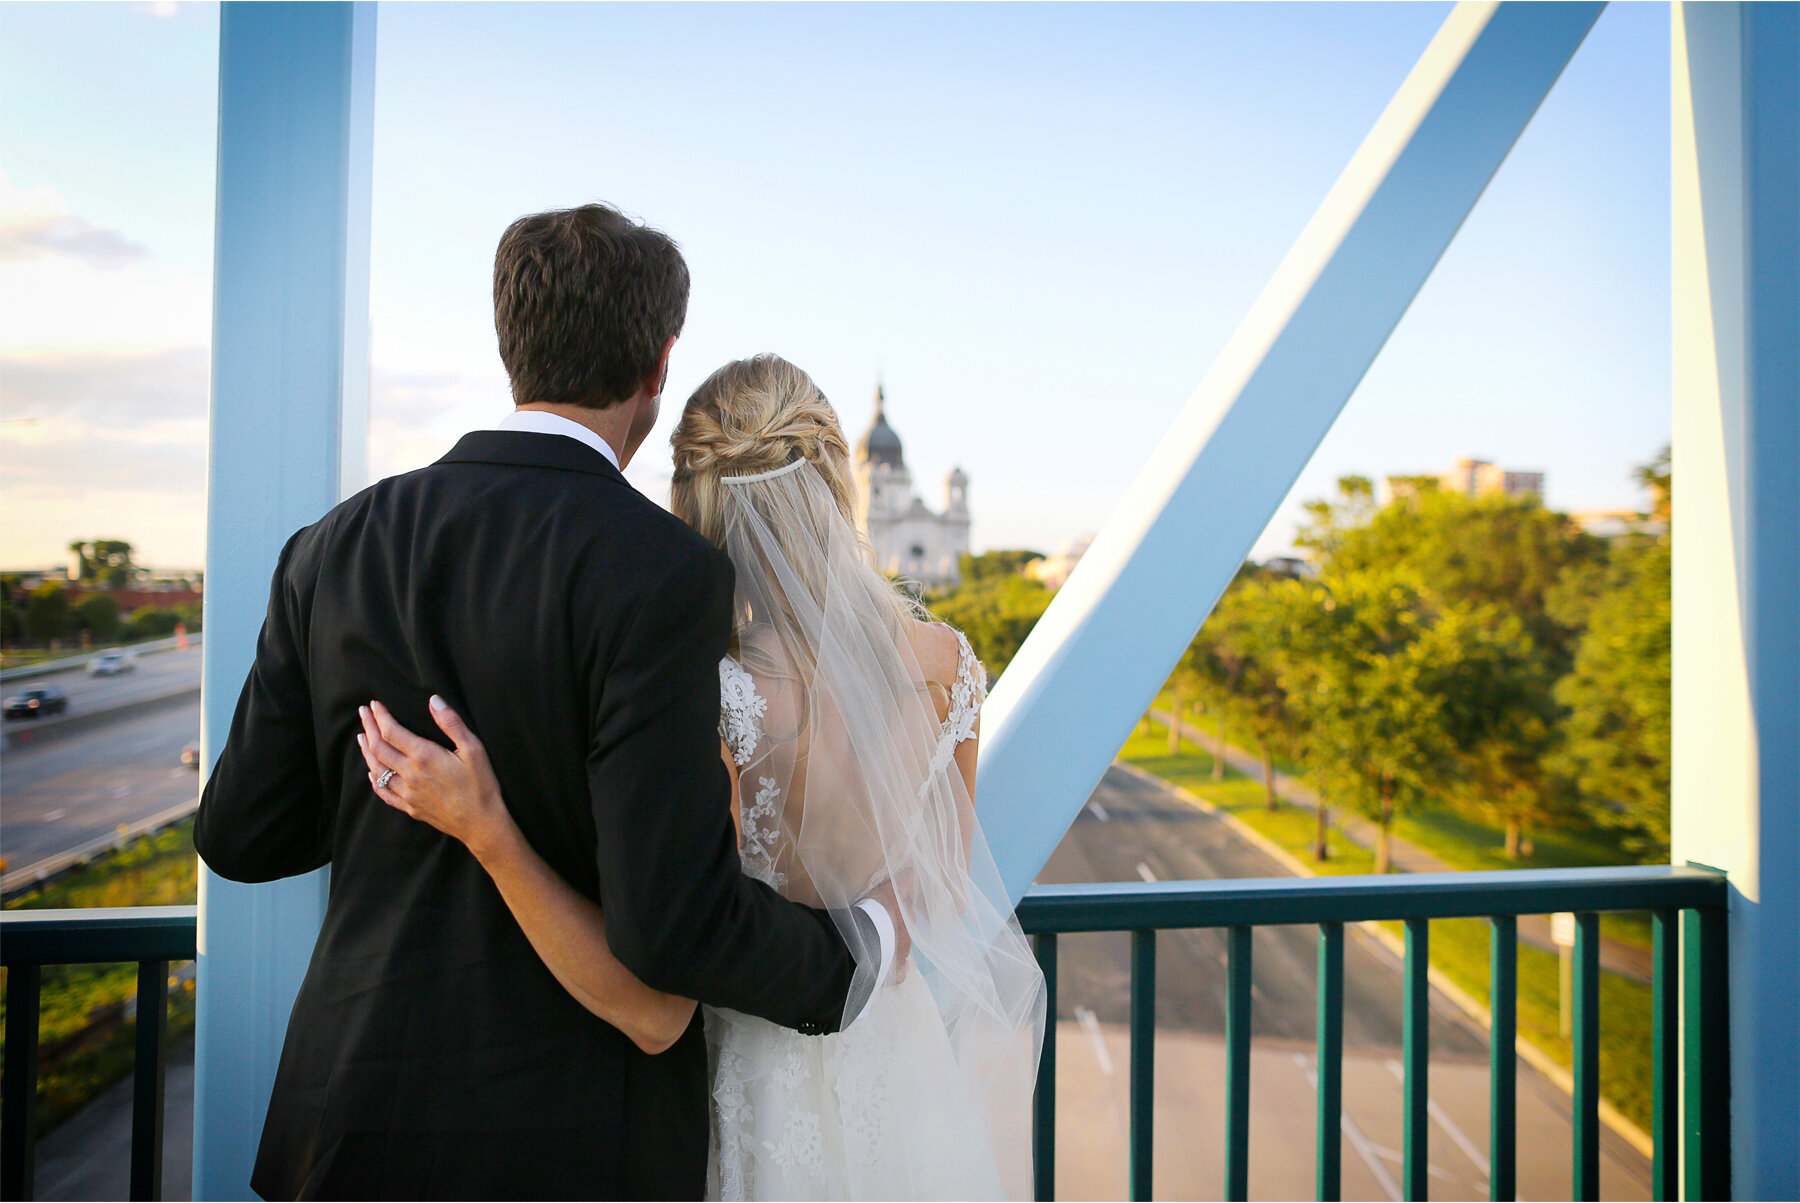 19 Wedding Vick Photography Minneapolis Minnesota Bride Groom Blue Bridge Sunset Michelle and William.jpg